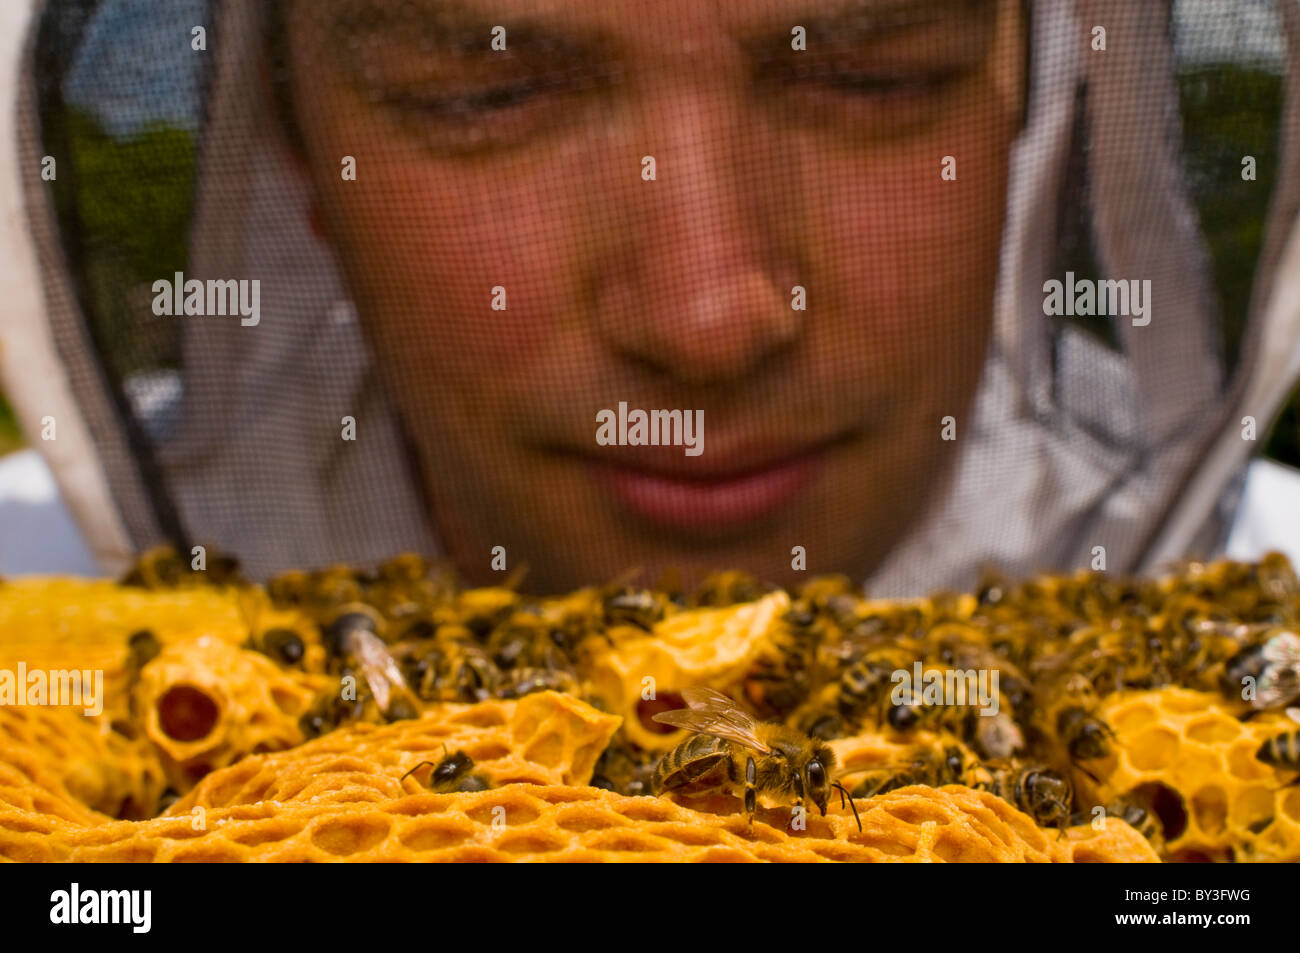 Beekeeper Honeybees Apis mellifera - Stock Image